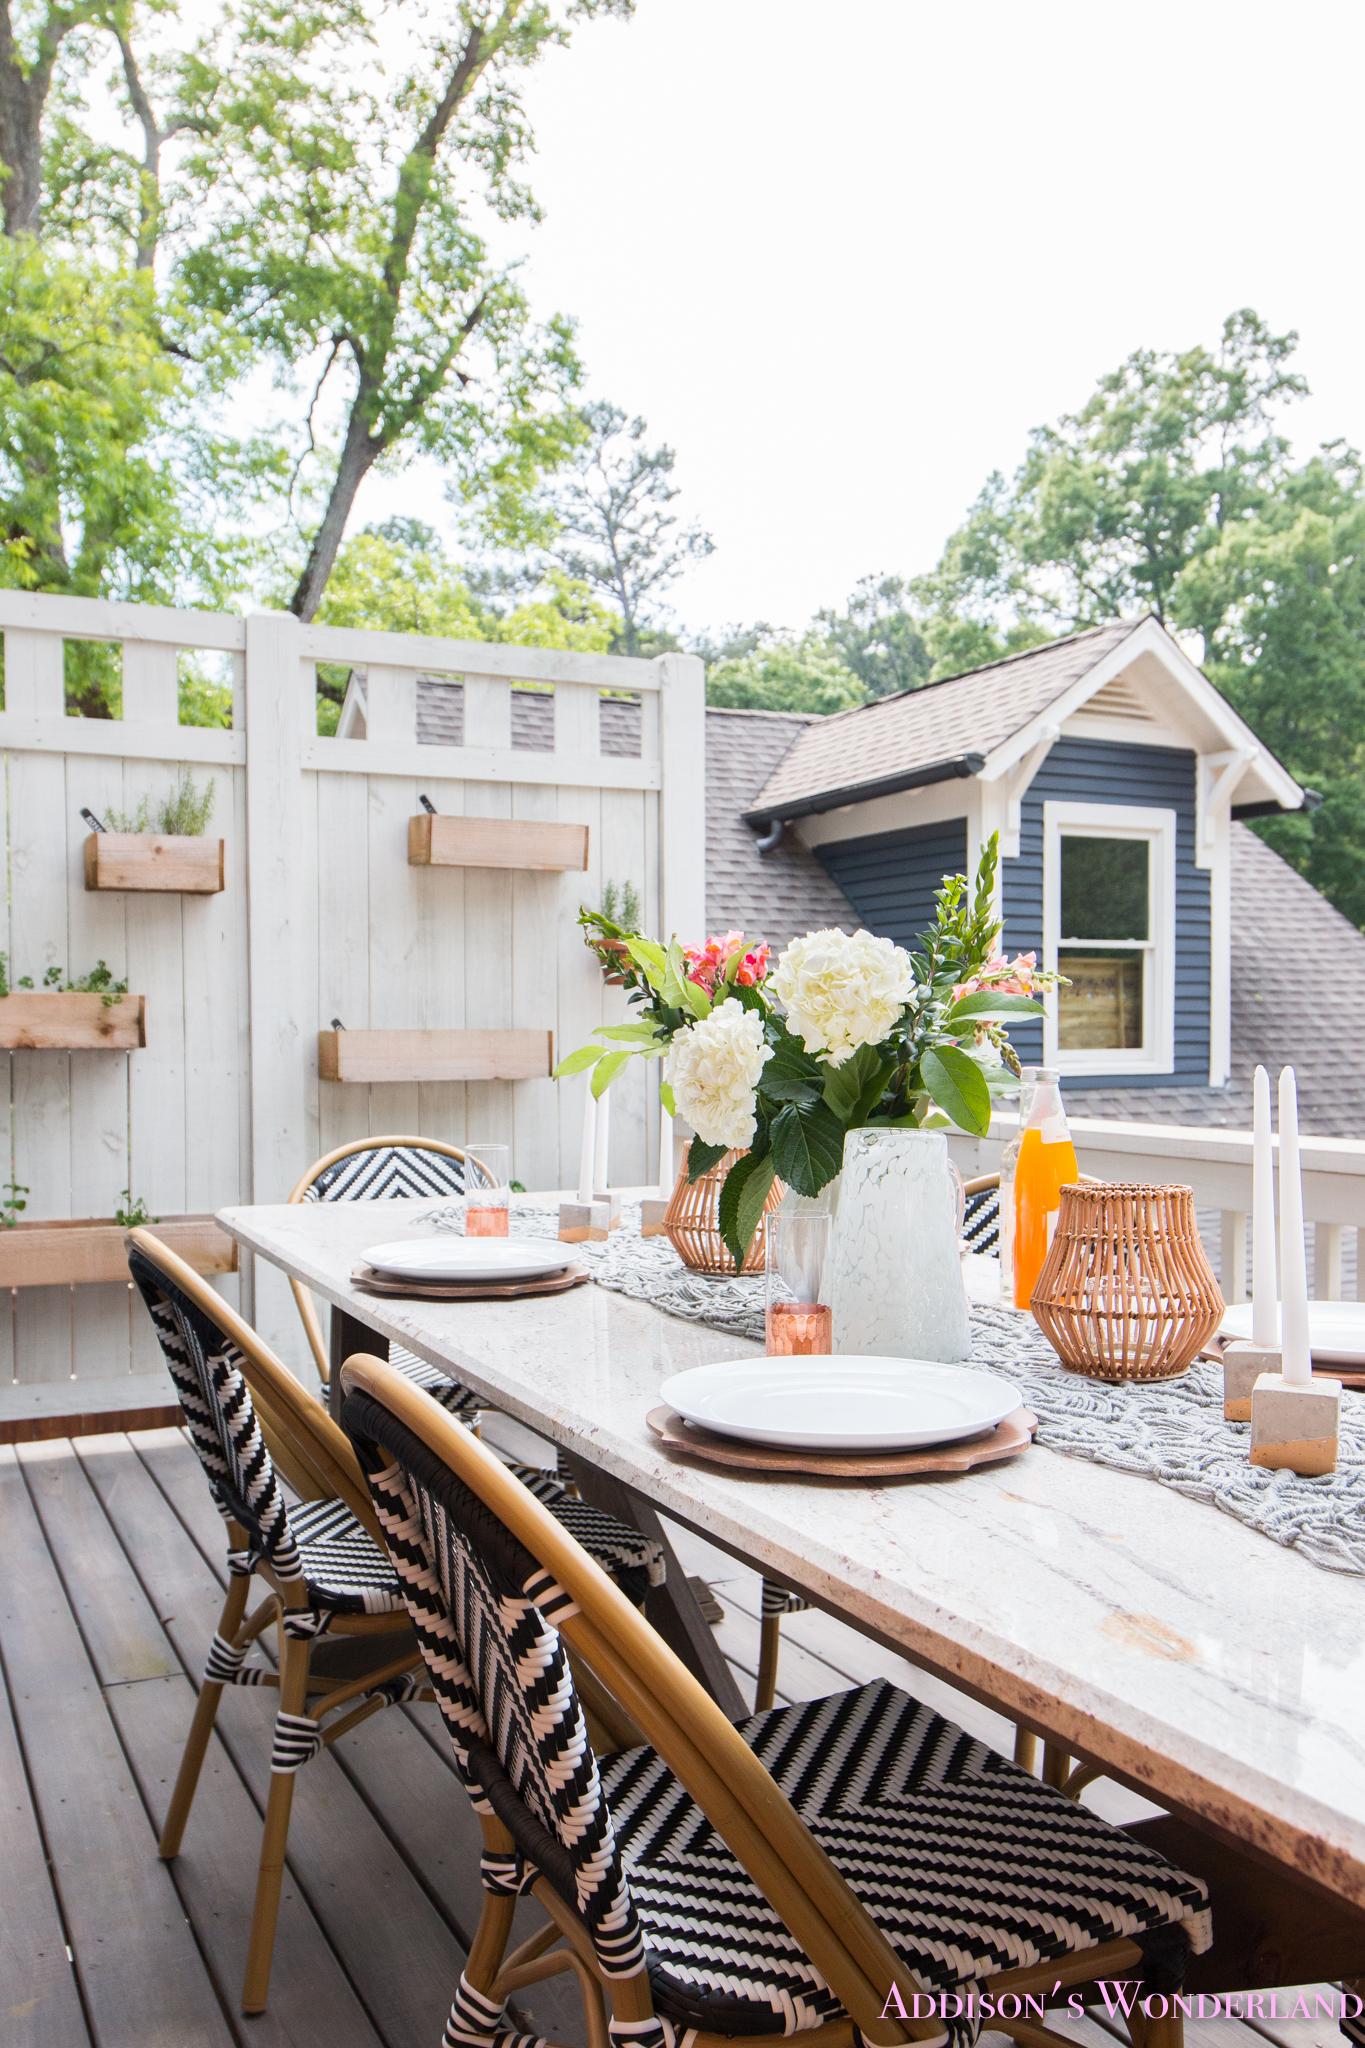 House Exteriors Archives - Addison's Wonderland on Backyard Table Decor id=34723